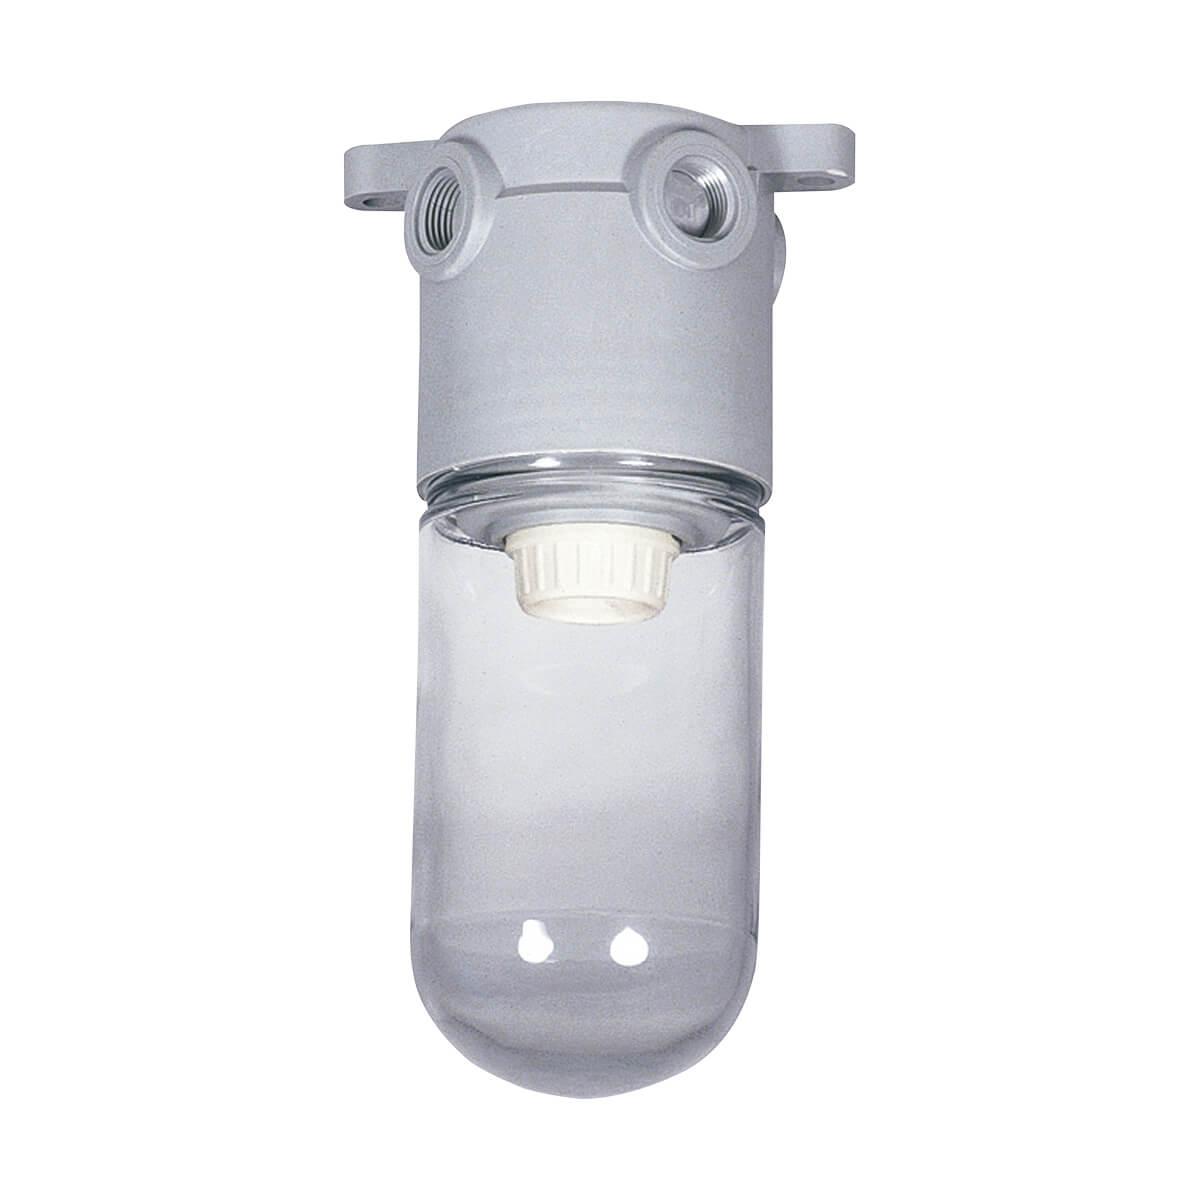 PVC Conduit Nonmetallic Vapor-Proof Incandescent Fixture - Clear Globehub